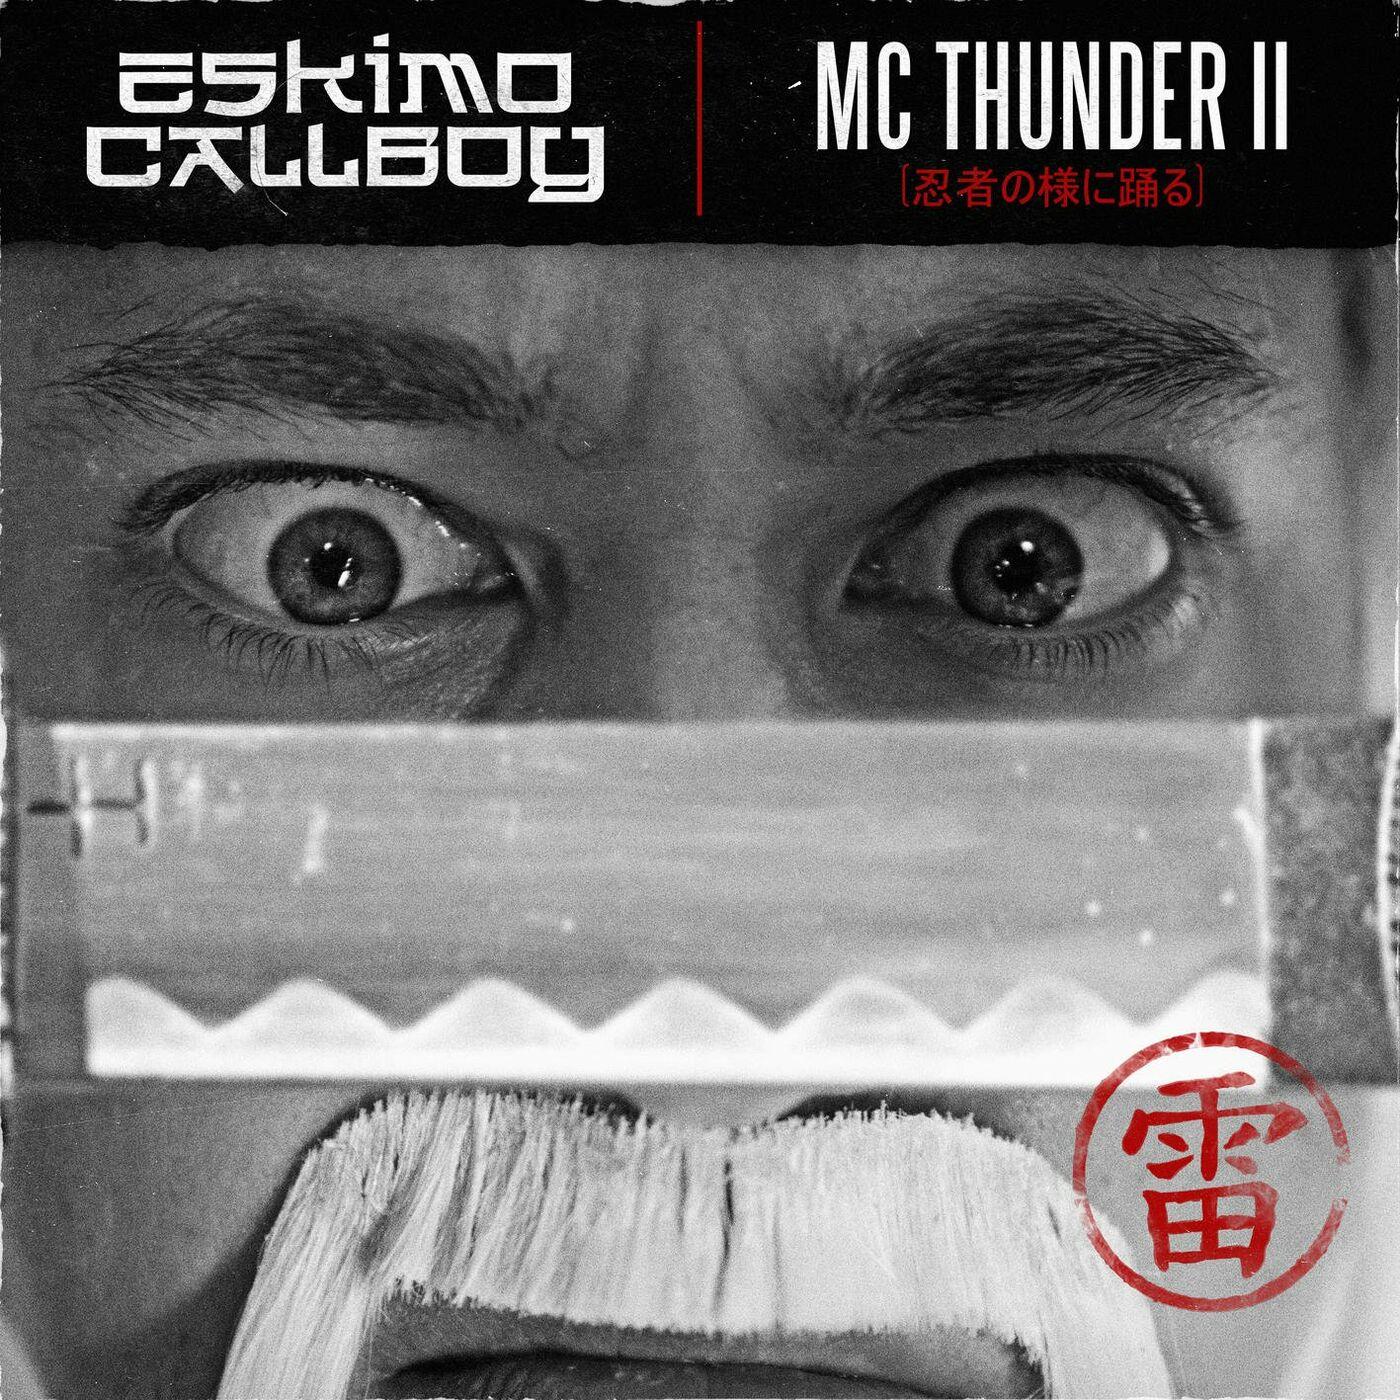 Eskimo Callboy - MC Thunder II (Dancing Like a Ninja) [single] (2020)